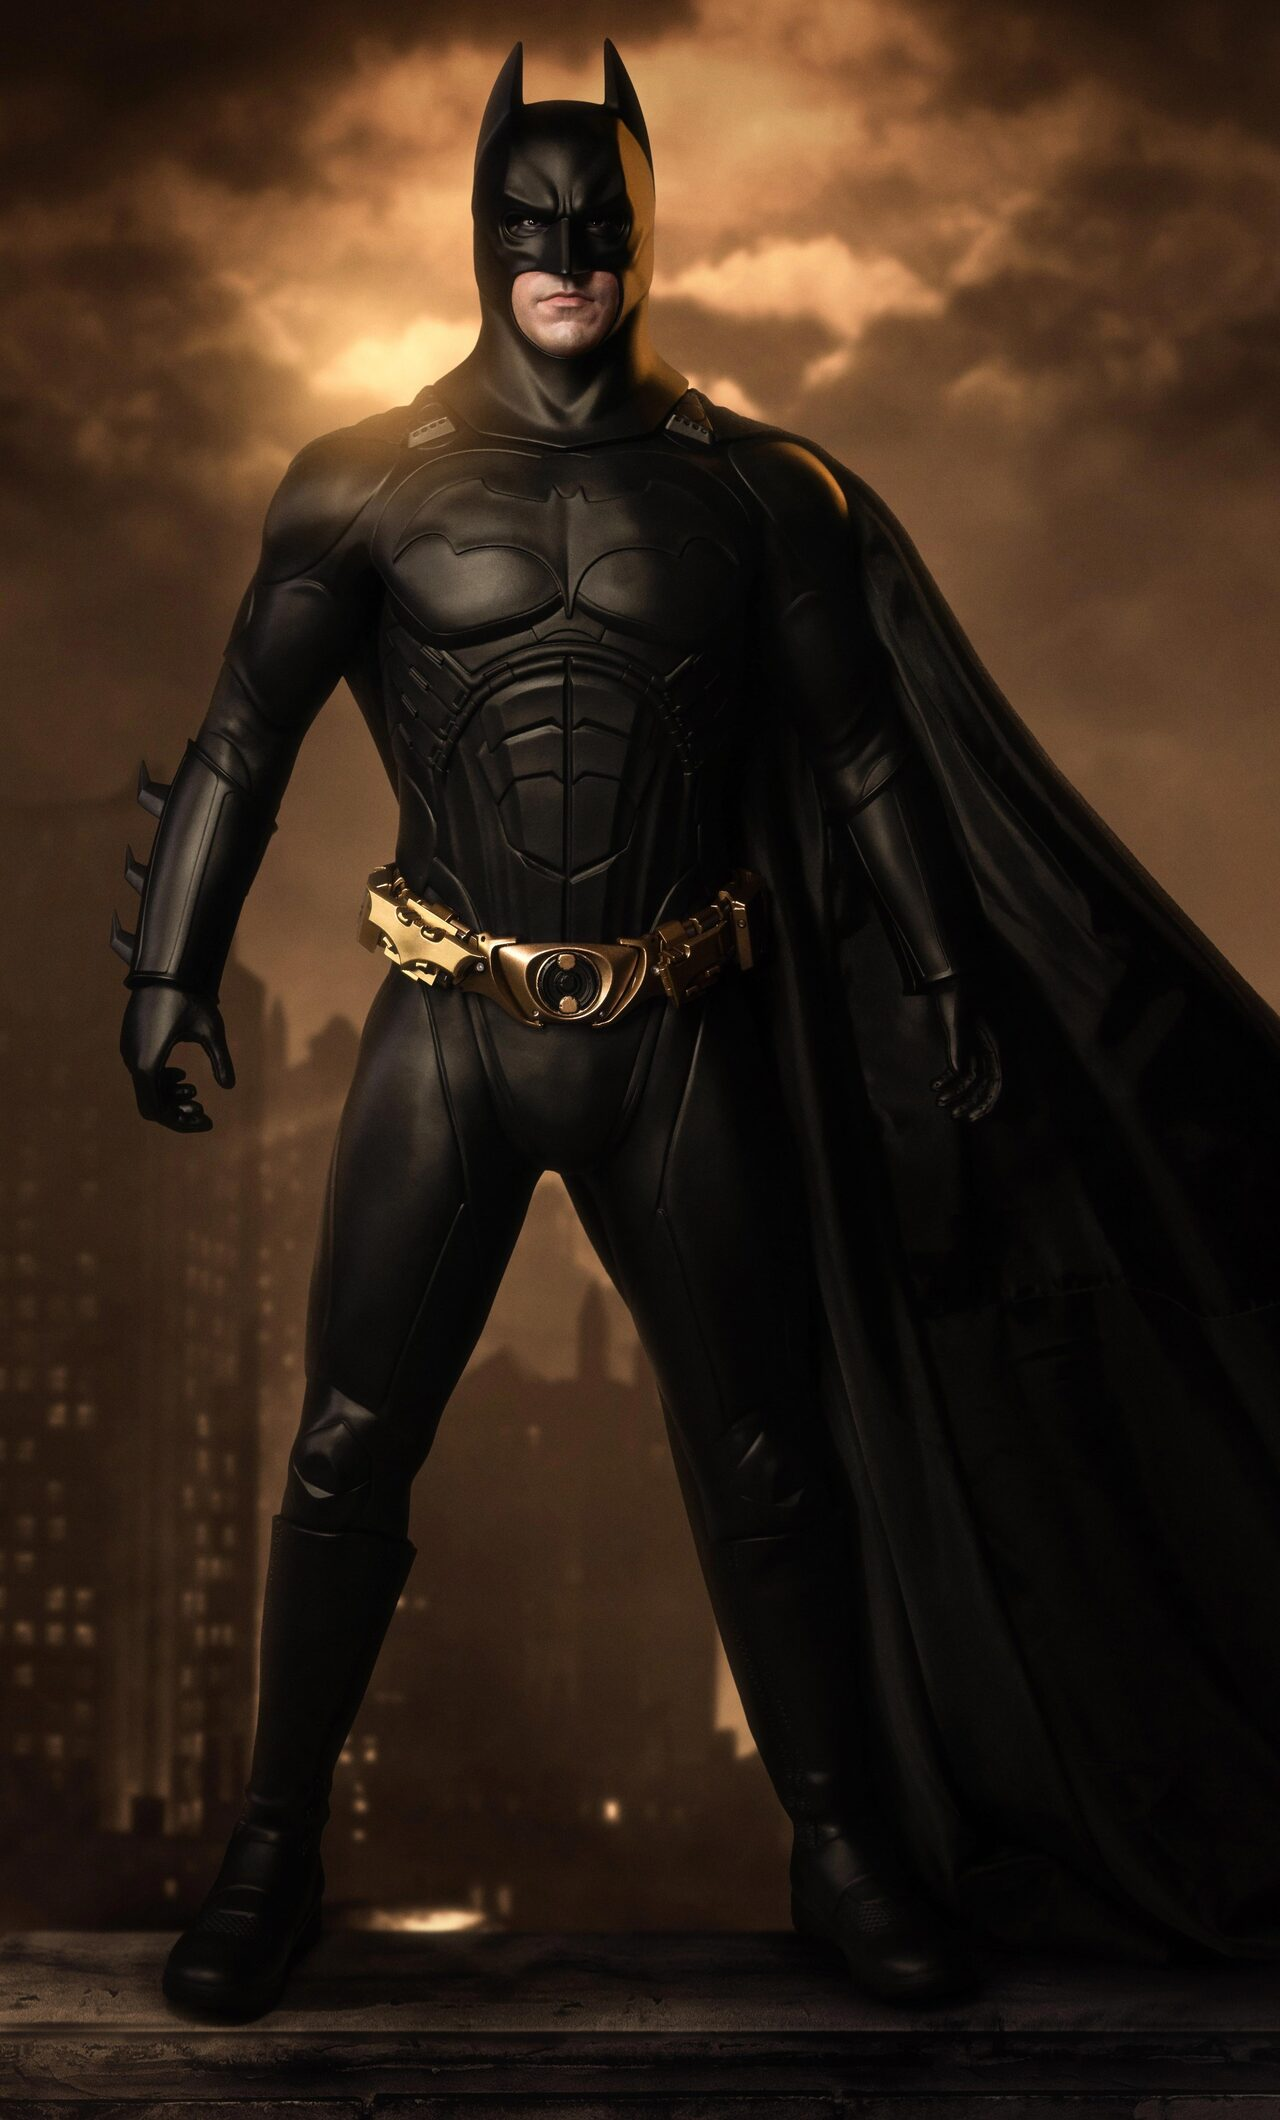 1280x2120 Batman Begins 4k iPhone 6+ HD 4k Wallpapers ...